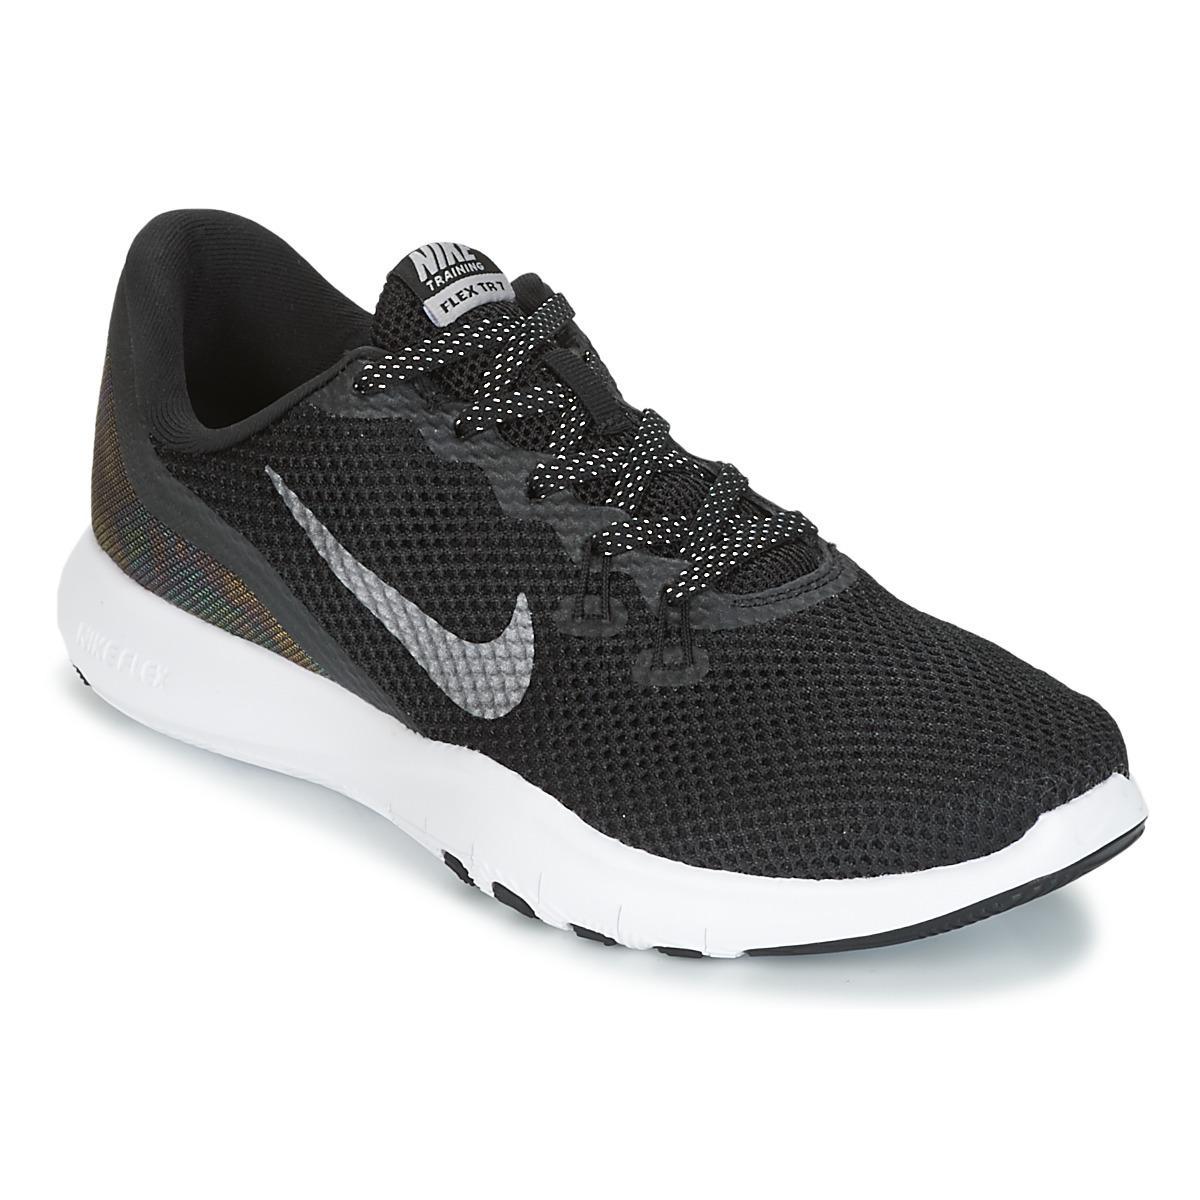 1da4f3b8aa37a Nike Flex Trainer 7 Metallic W Women s Trainers In Black in Black - Lyst